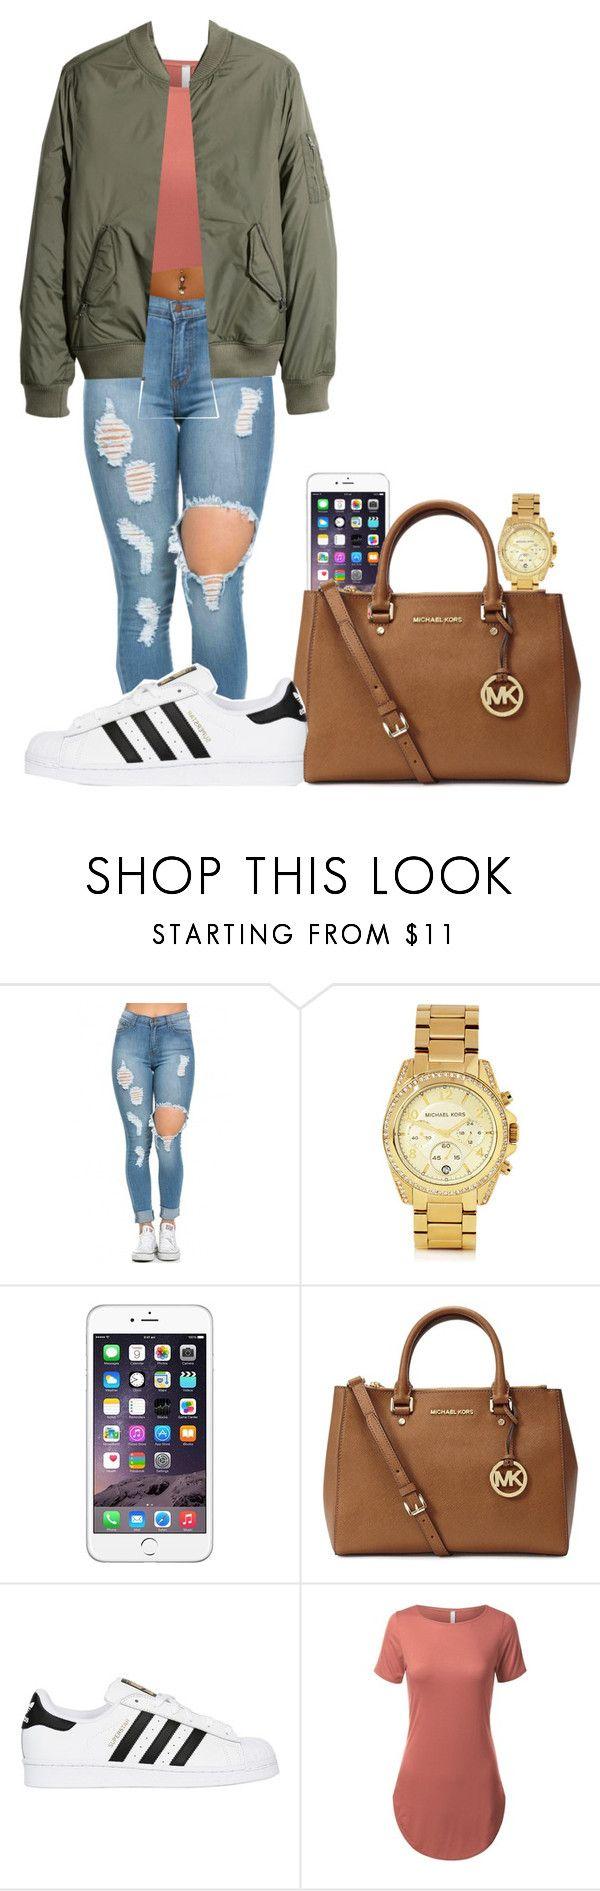 Adidas Superstars by bestdressed101 on Polyvore featuring H&M, adidas Originals and Michael Kors